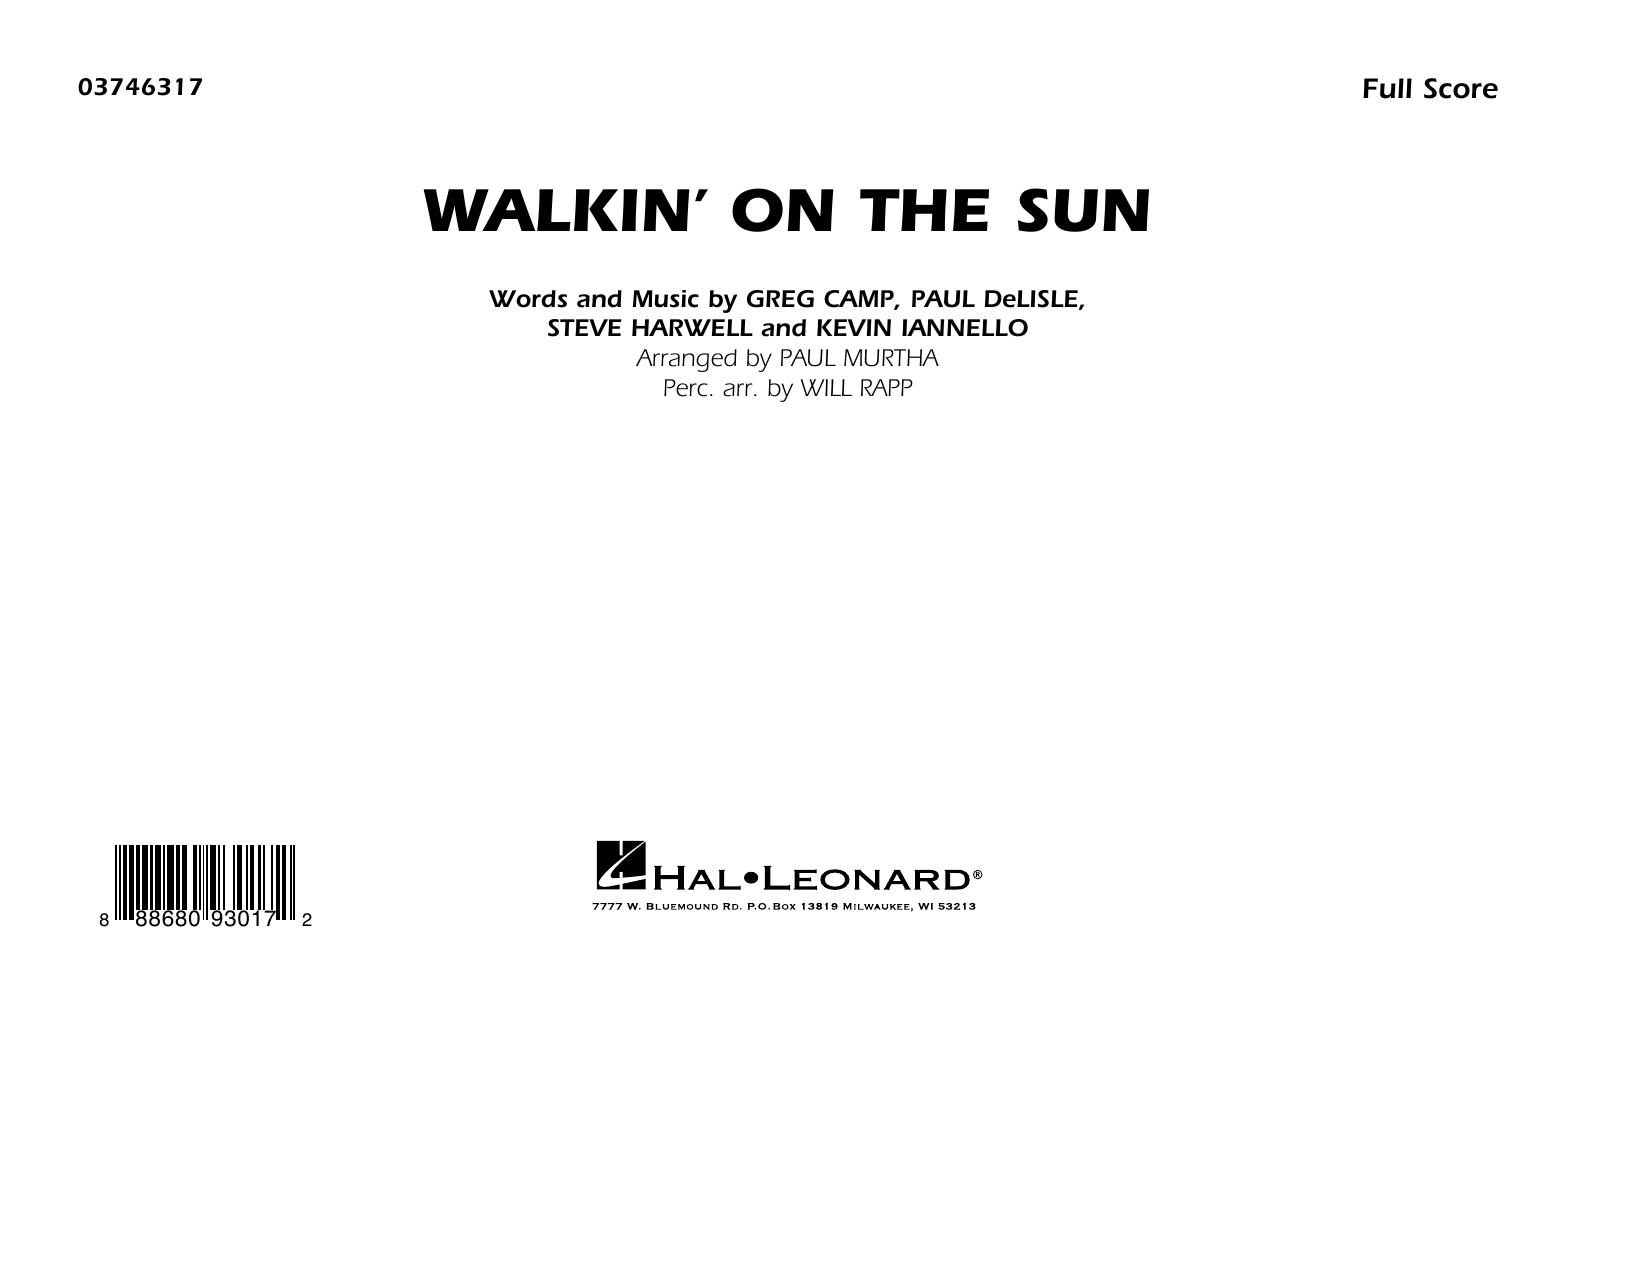 Walkin' on the Sun (arr. Paul Murtha) - Conductor Score (Full Score) (Marching Band)